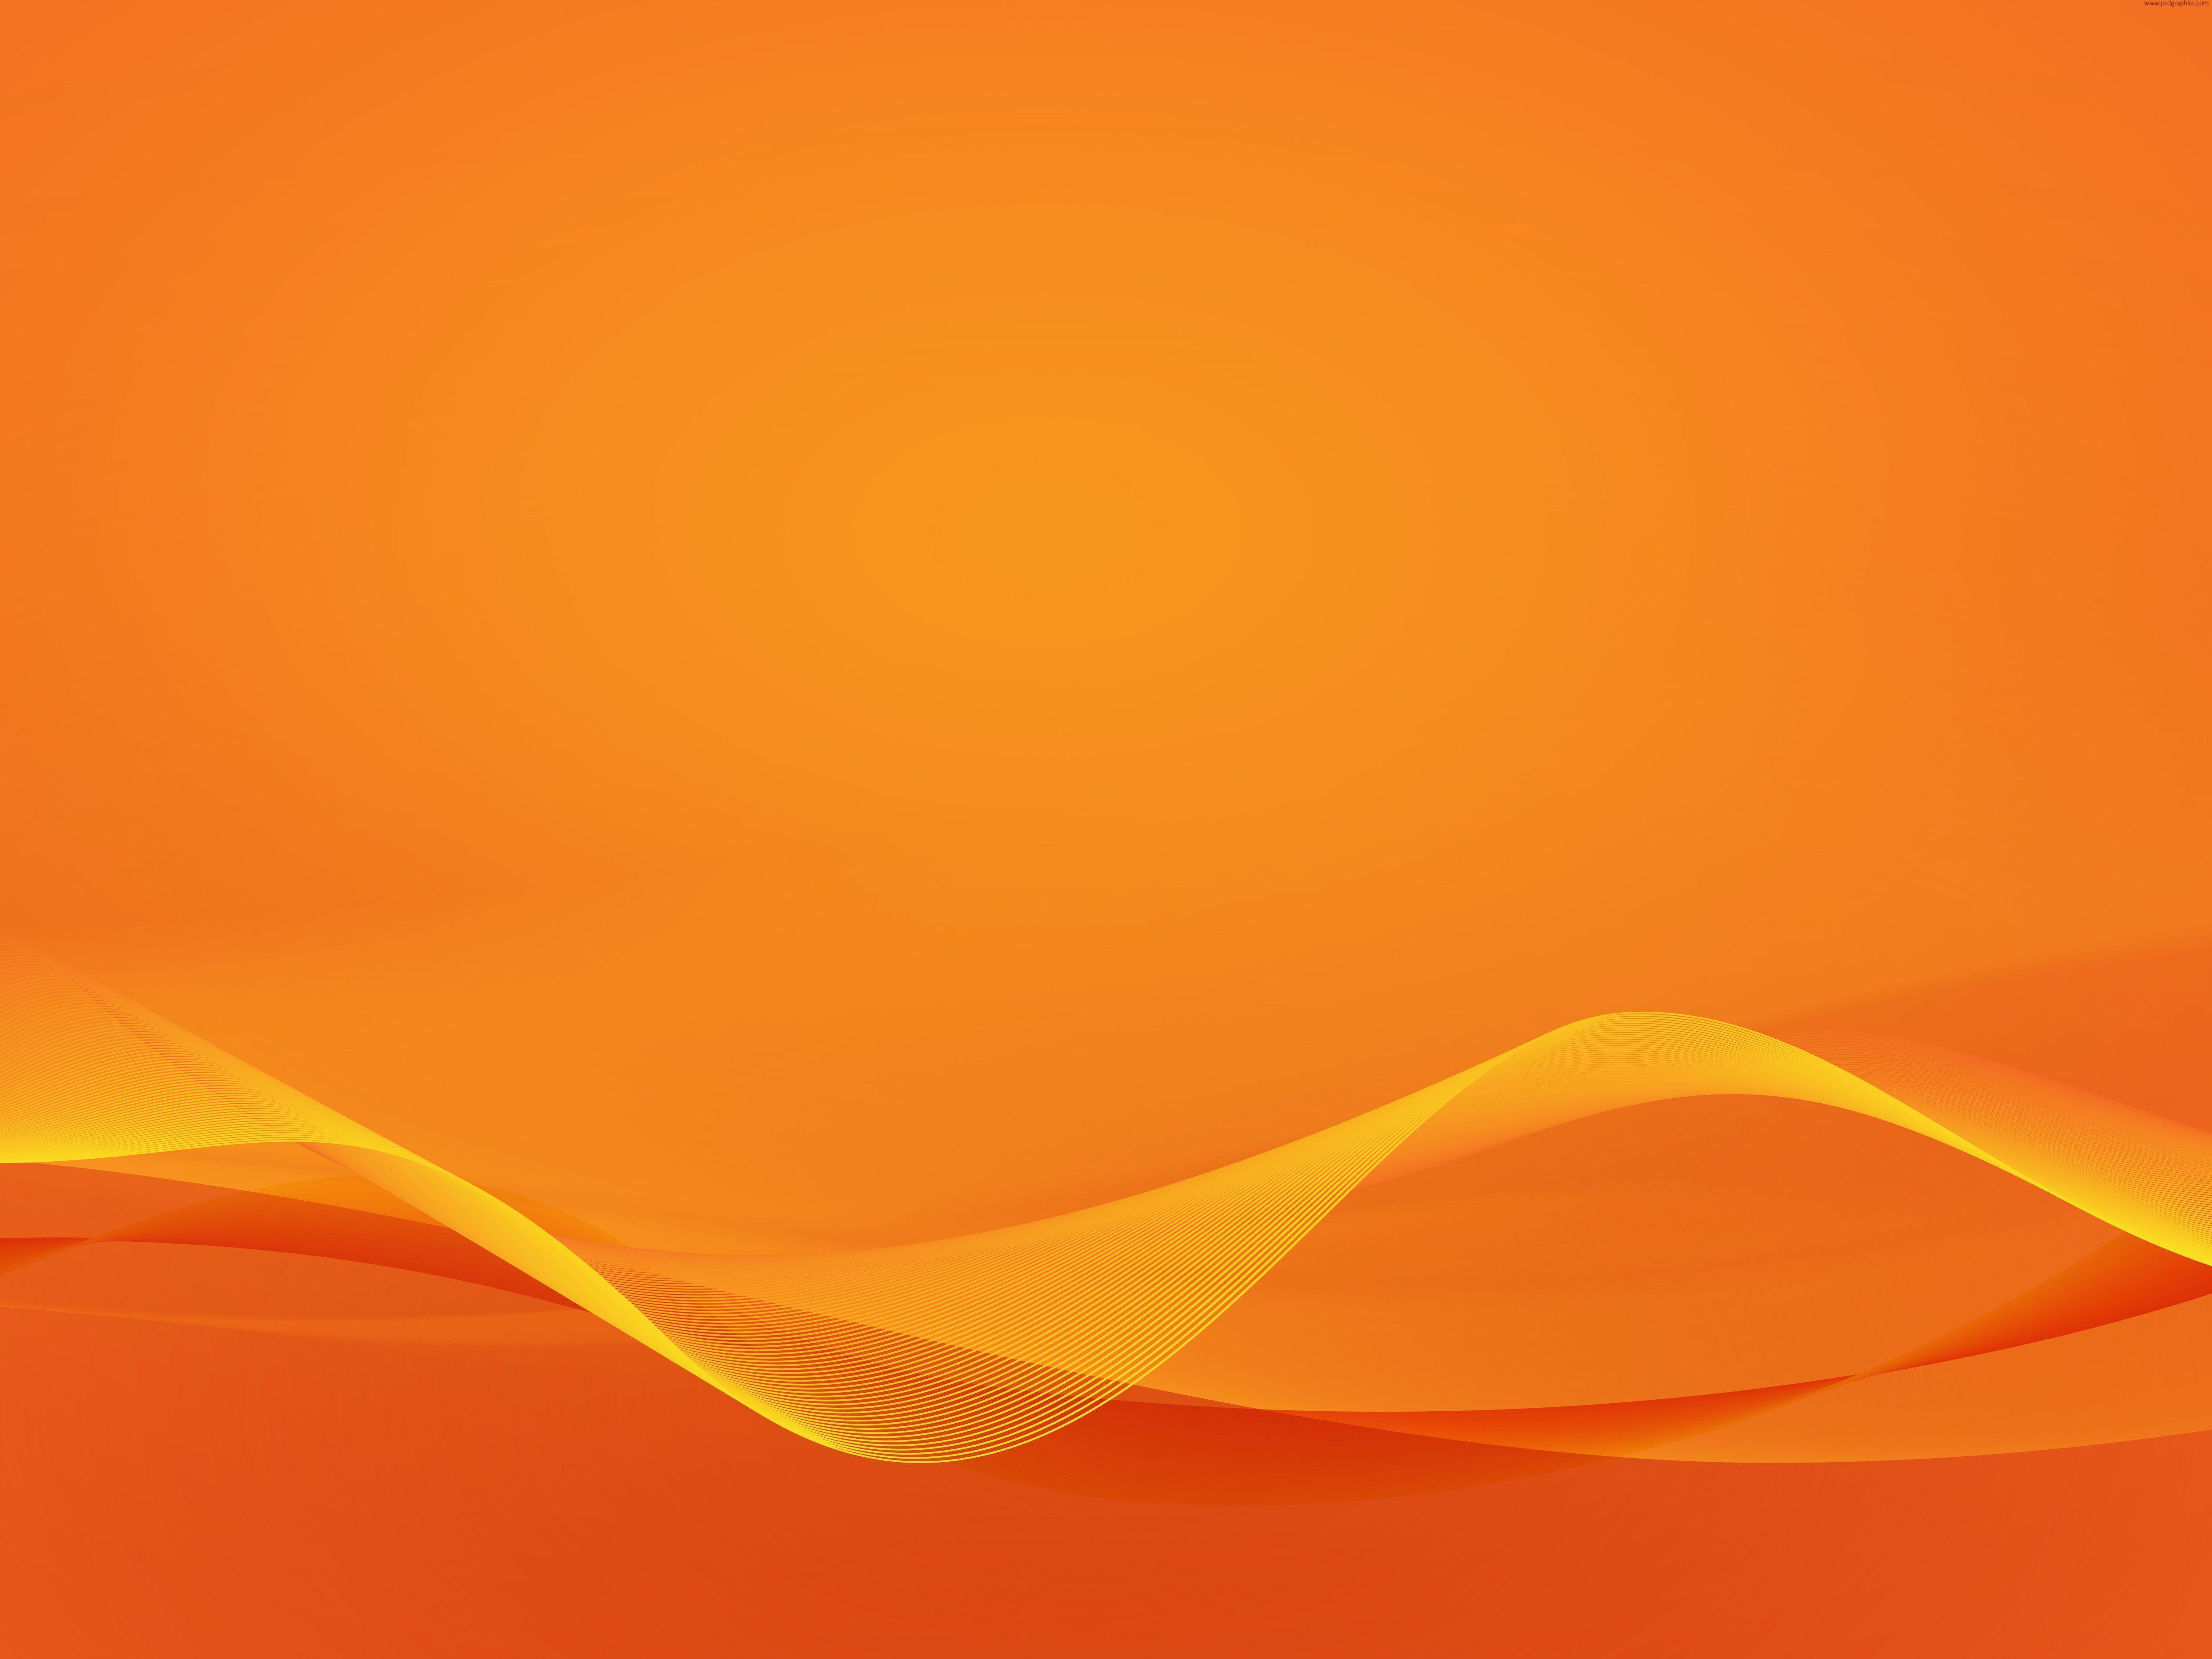 orange backgrounds image wallpaper cave